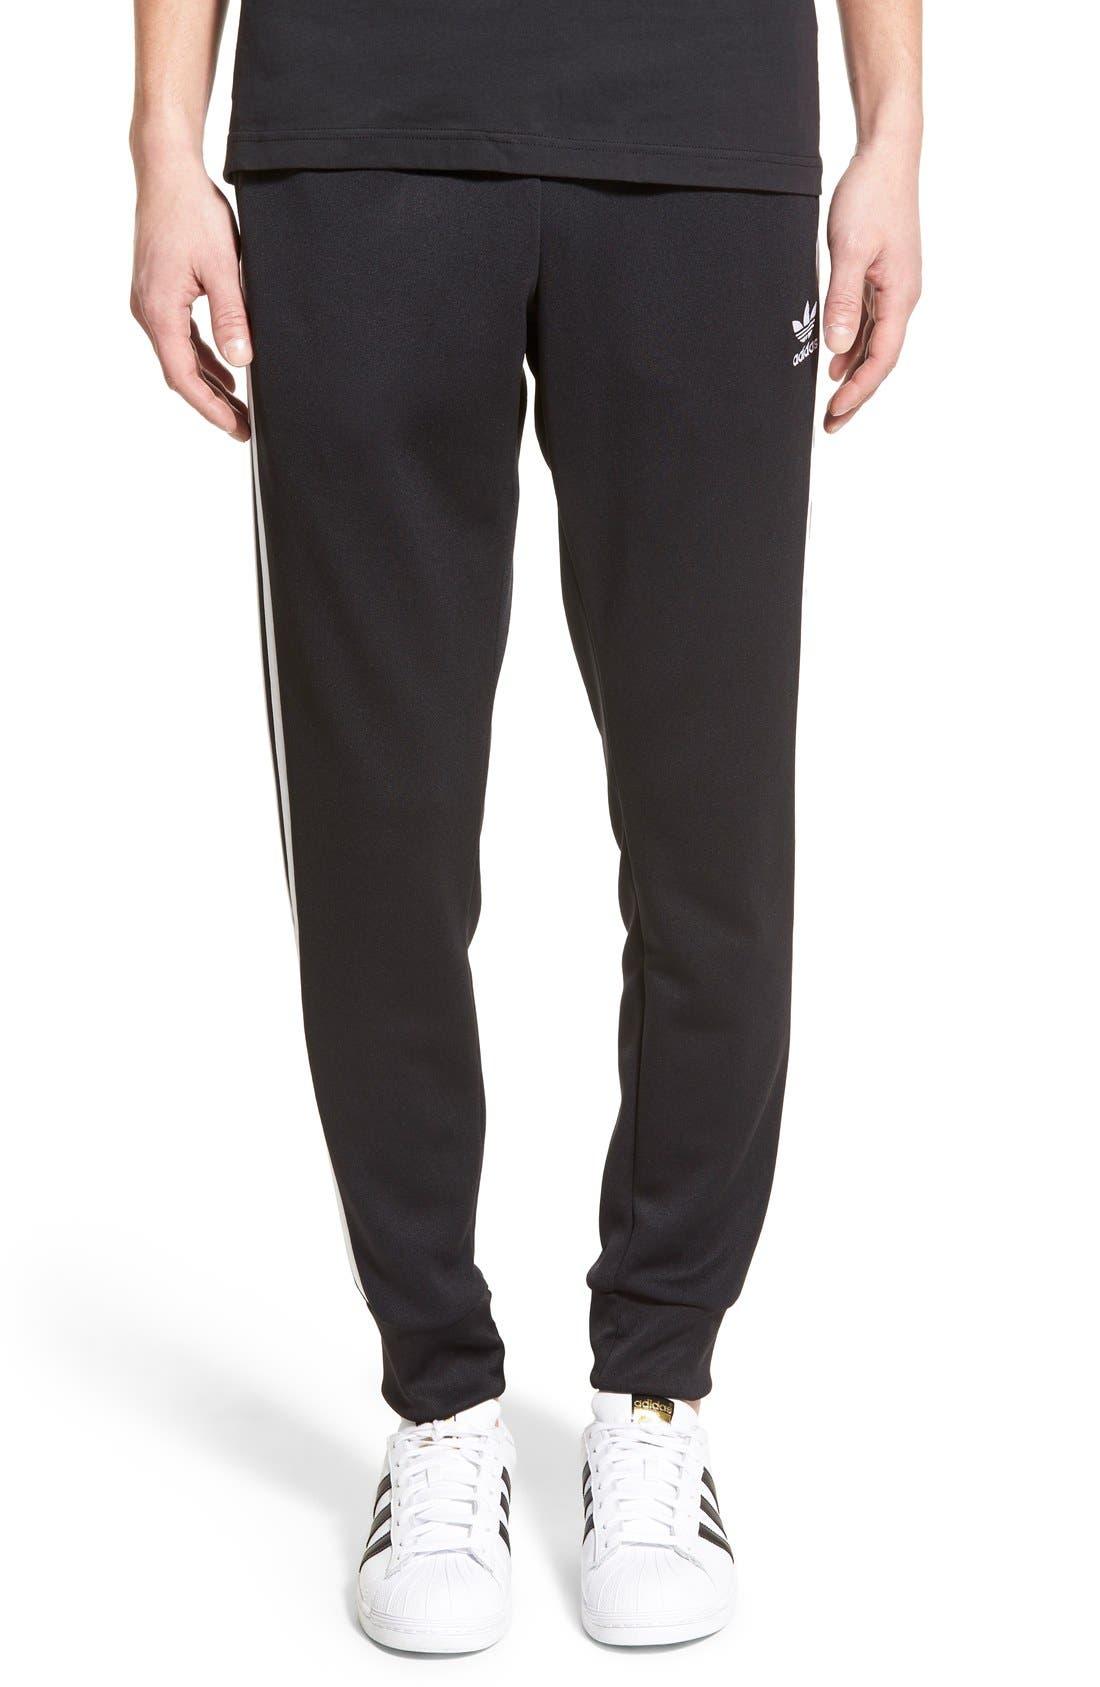 Alternate Image 1 Selected - adidas Originals 'Superstar' Track Pants